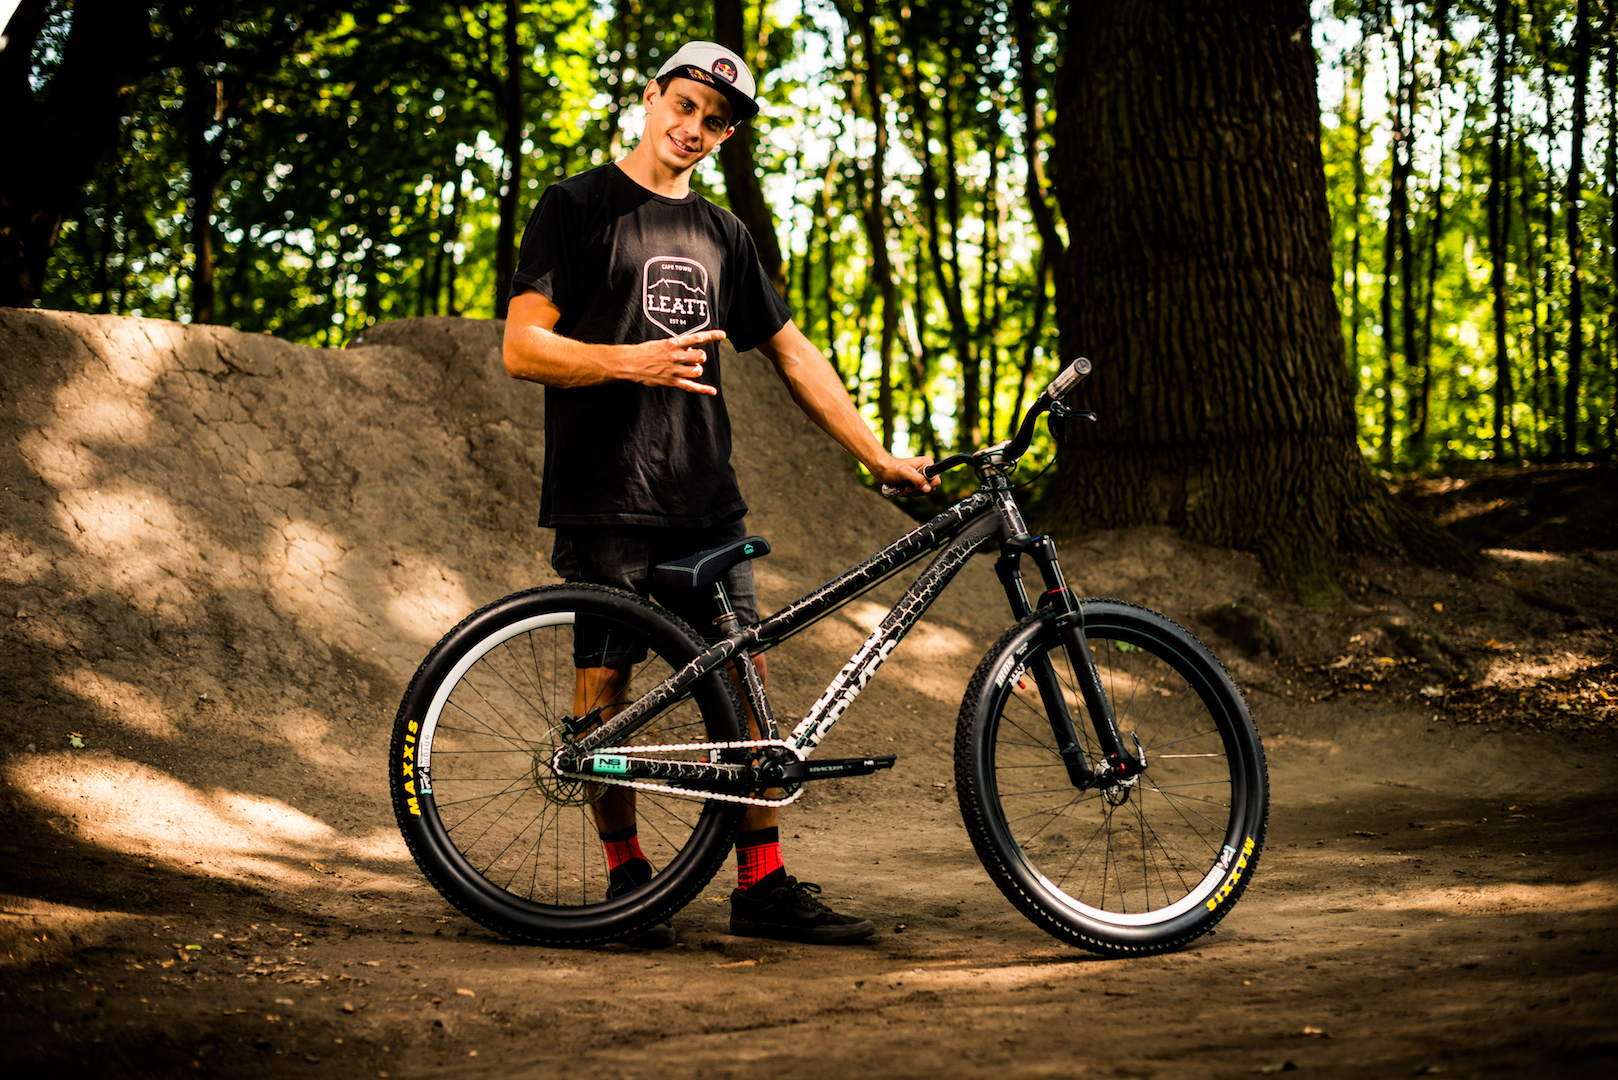 szaman bike check-46 web.jpg